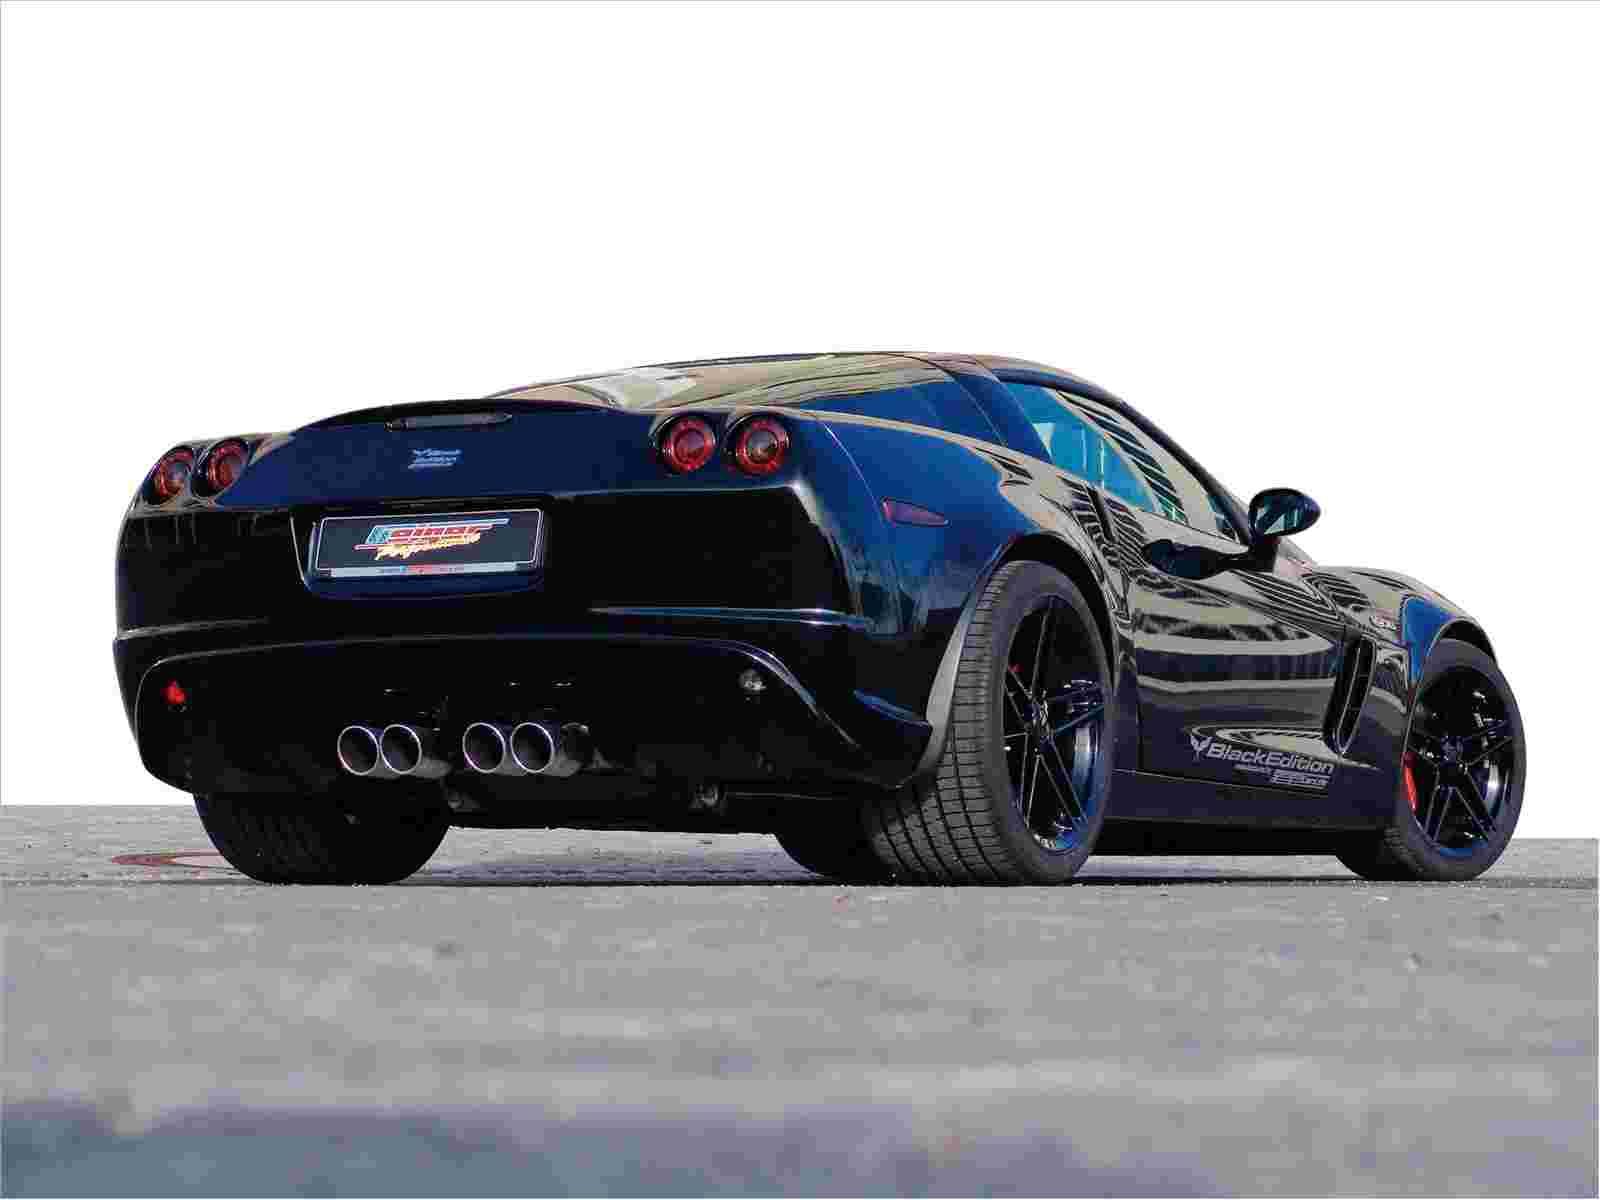 z06 corvette wallpaper corvette collection corvette z06 corvette z06 1600x1200